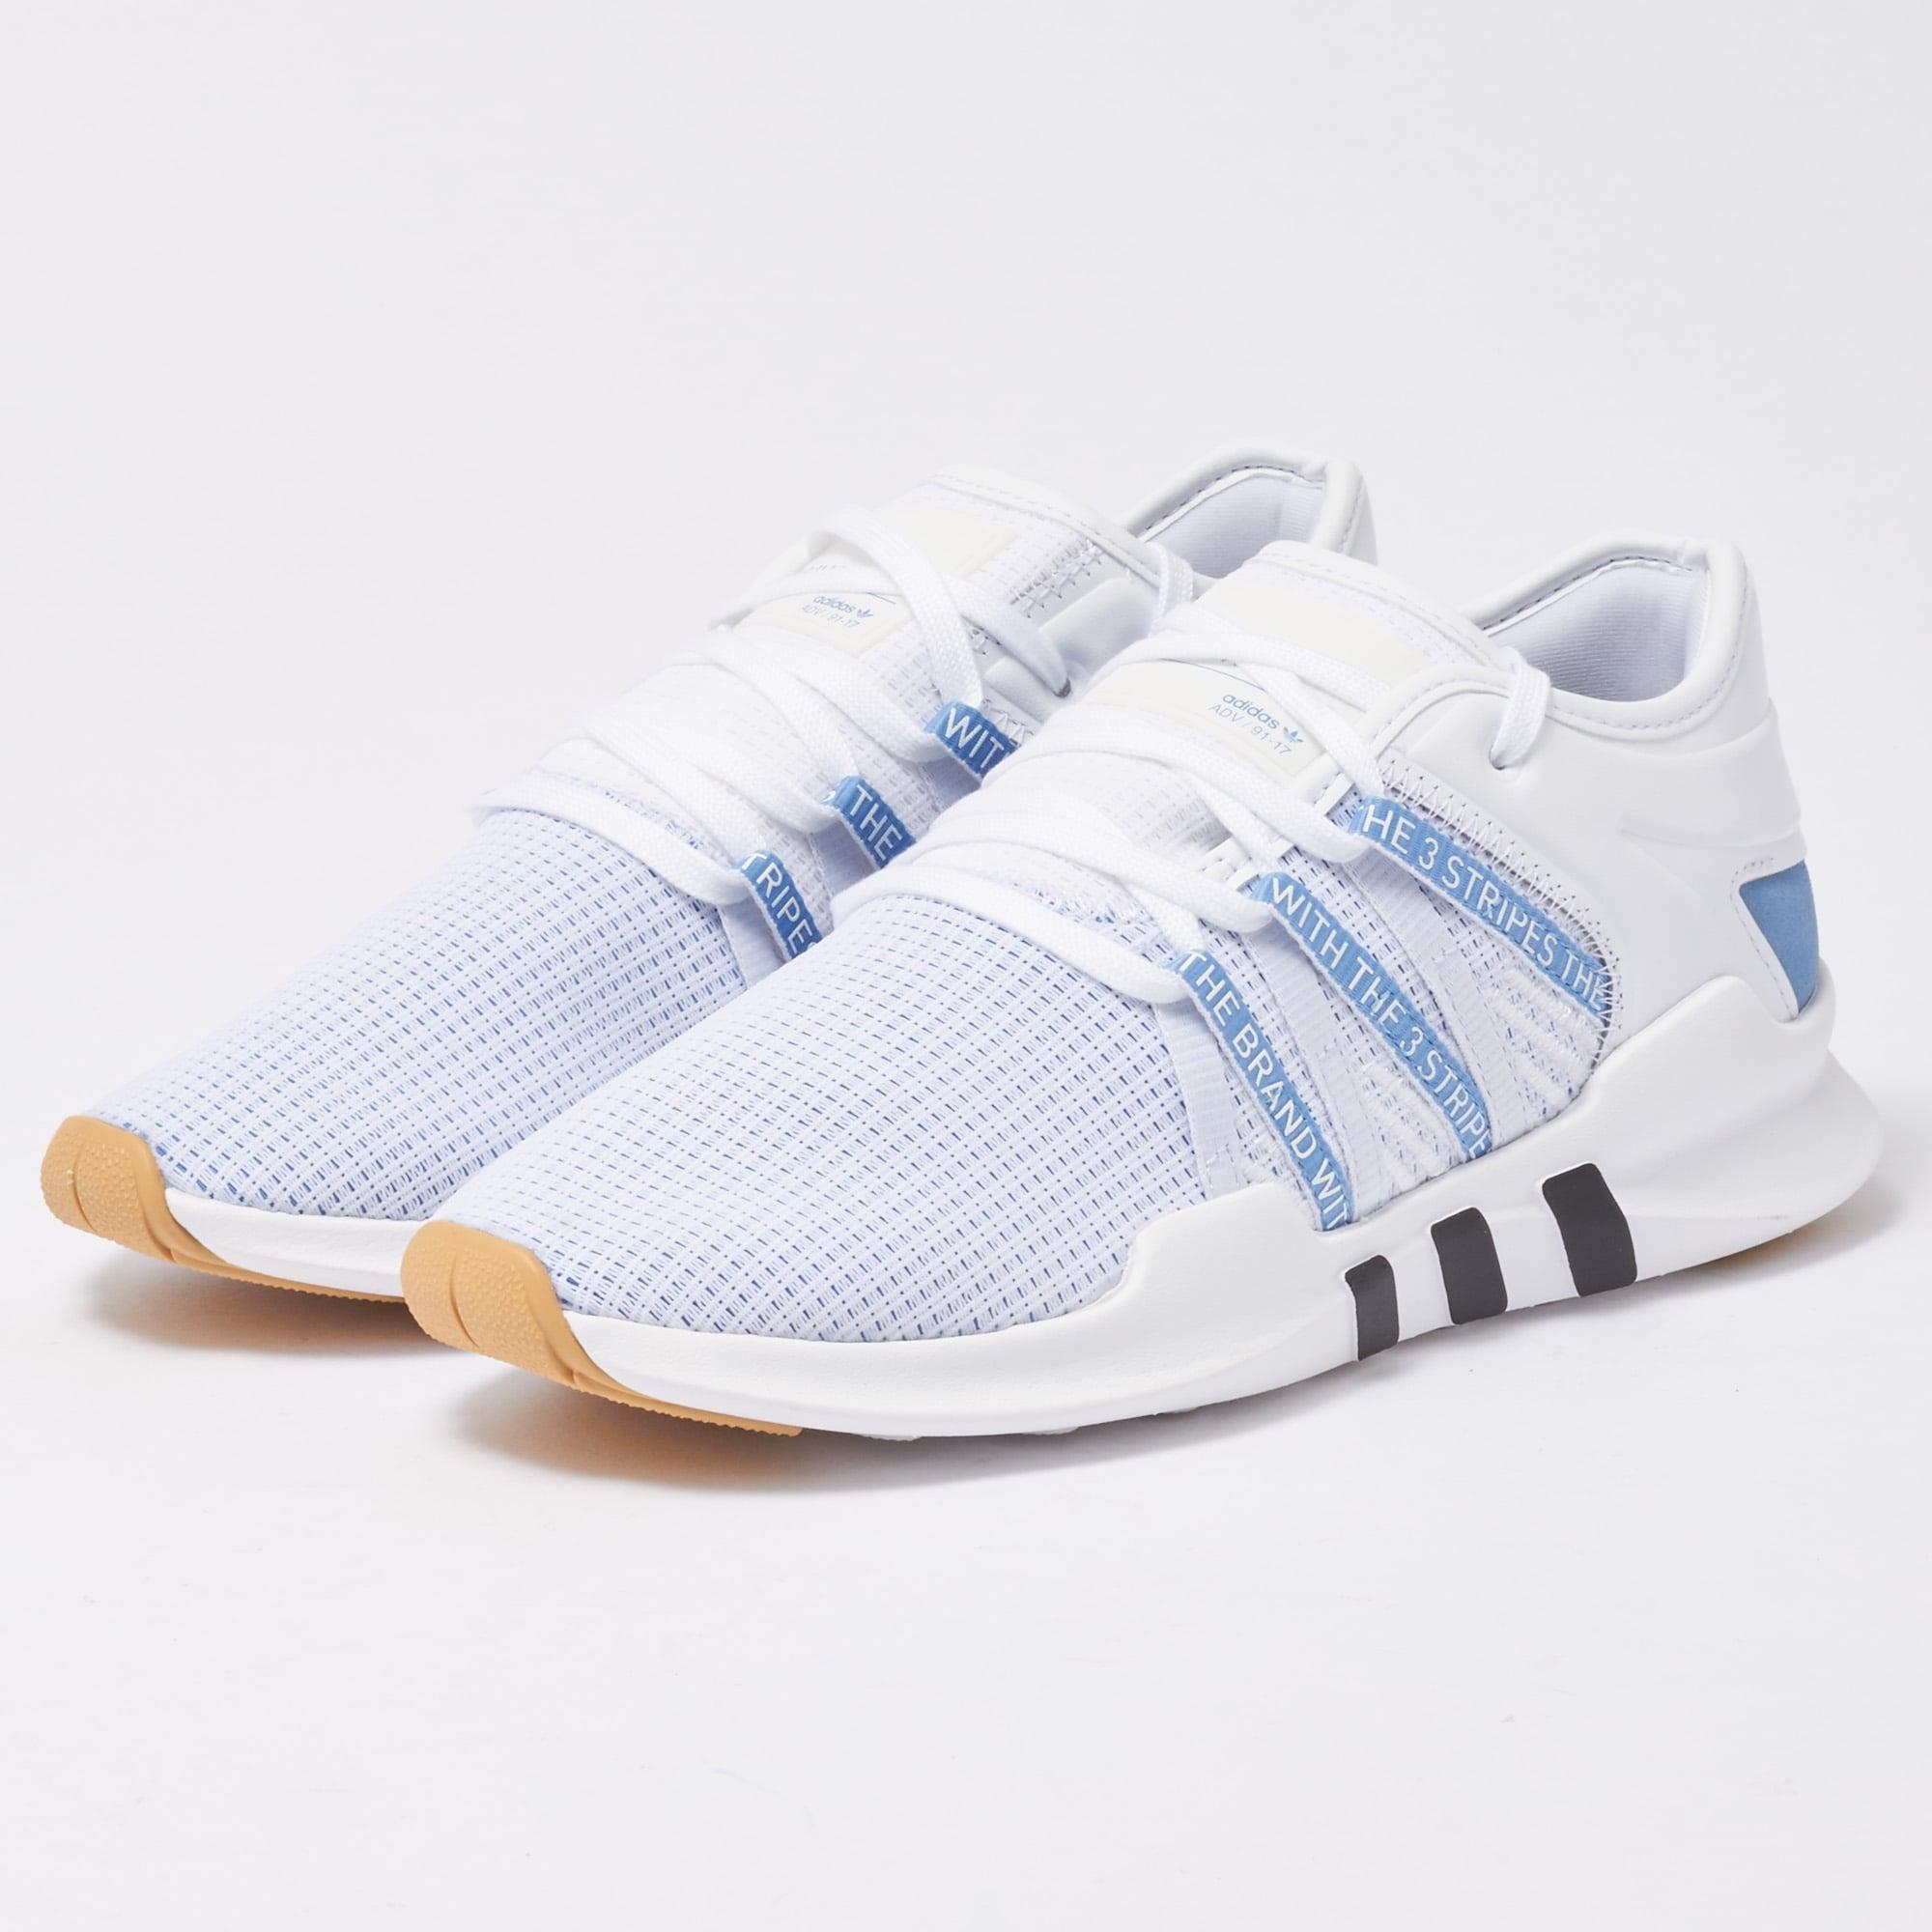 Blue EQT ADV Racing Shoes W CQ2155